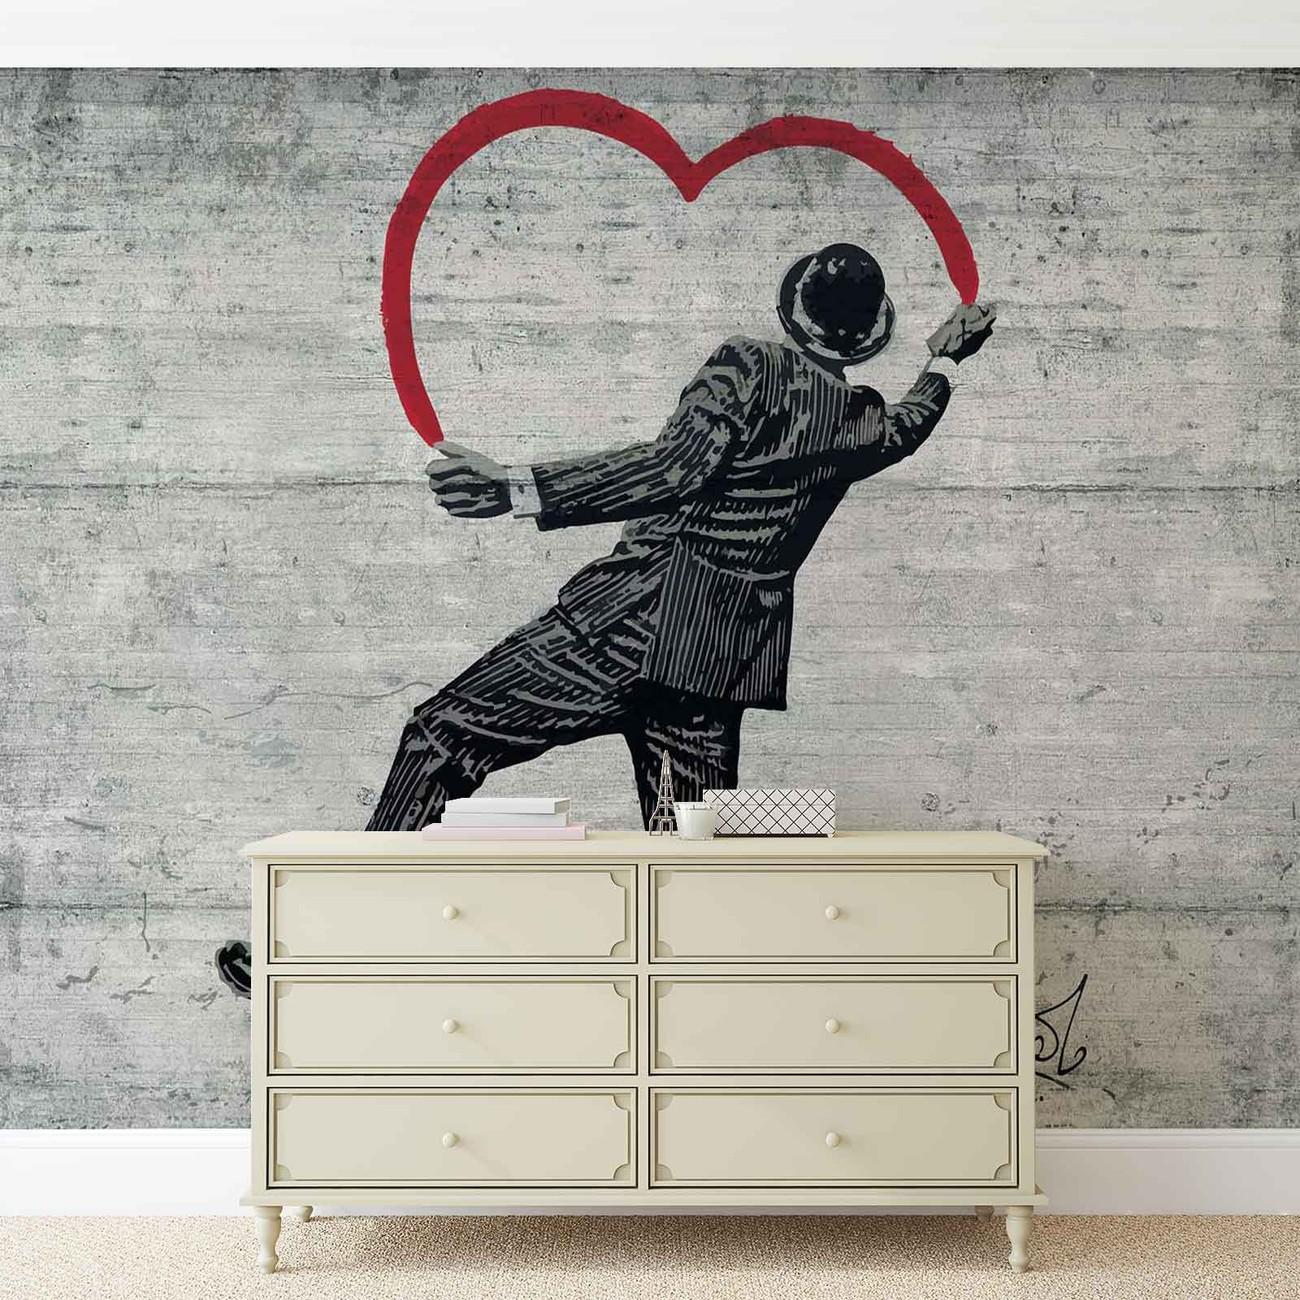 Banksy Graffiti Concrete Wall Paper Mural